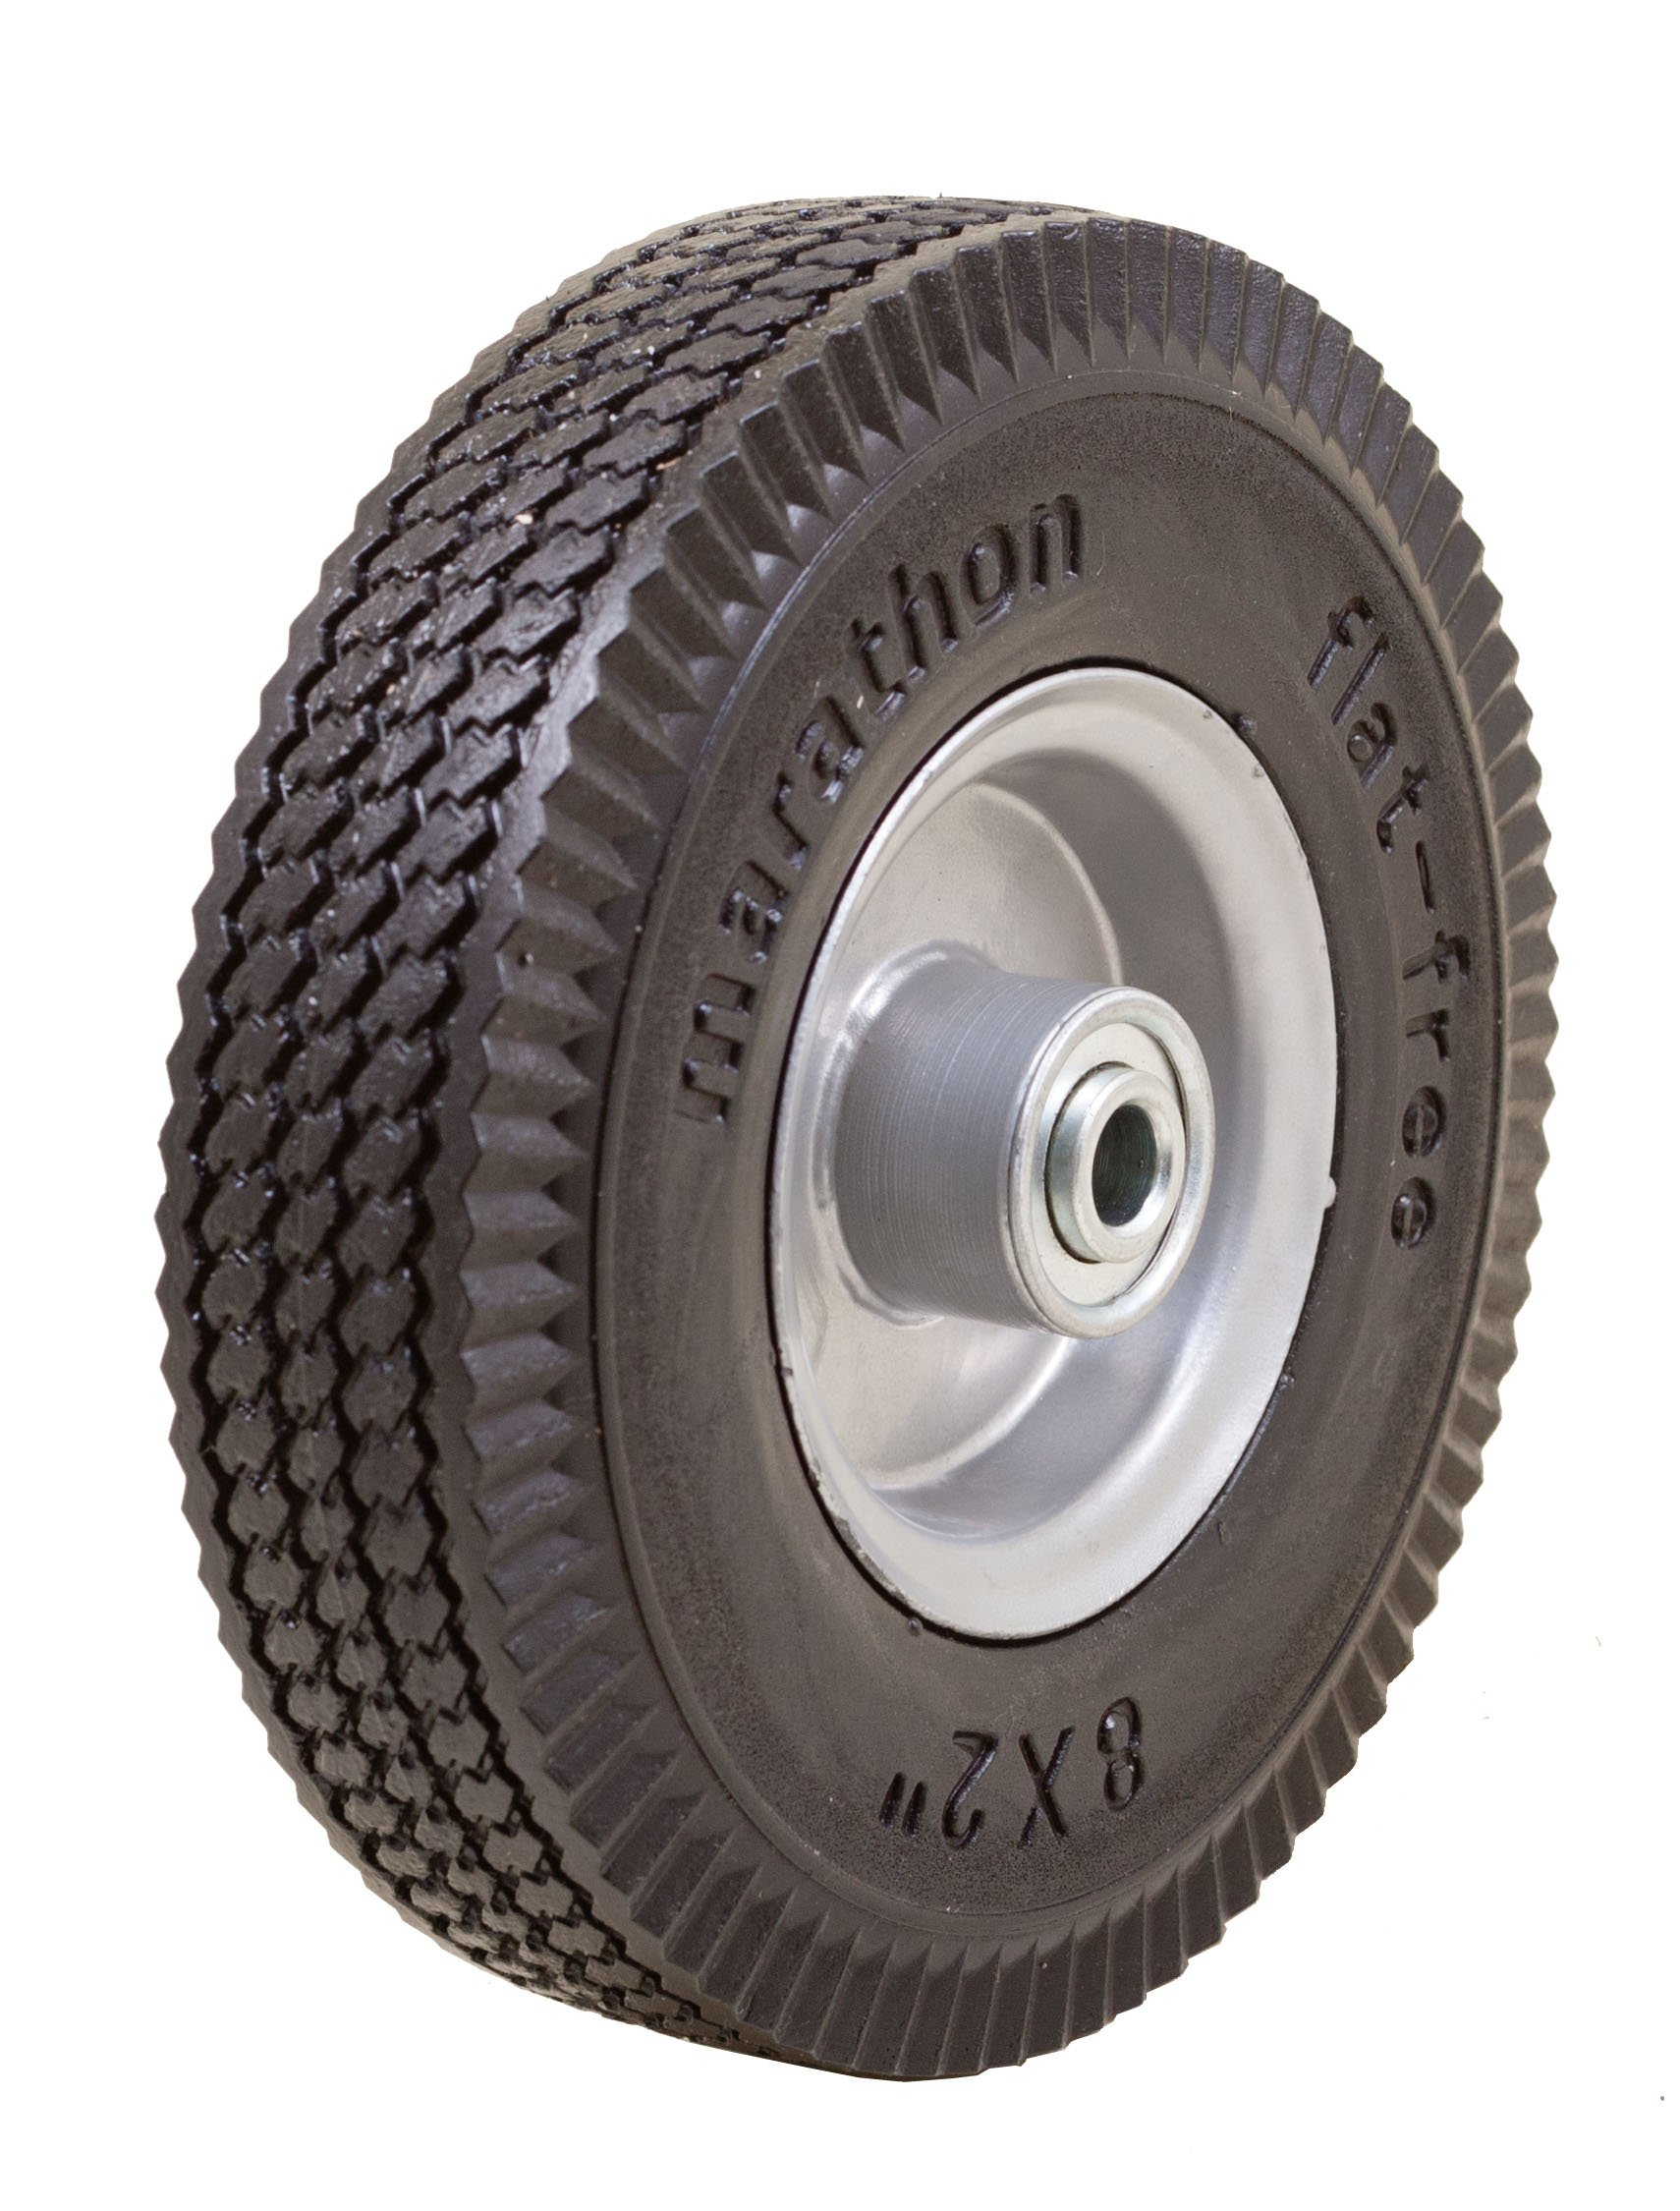 Marathon 8x2 Flat Free, Hand Truck/All Purpose Utility Tire on Wheel, 2.375'' Centered Hub, 1/2'' Bearings